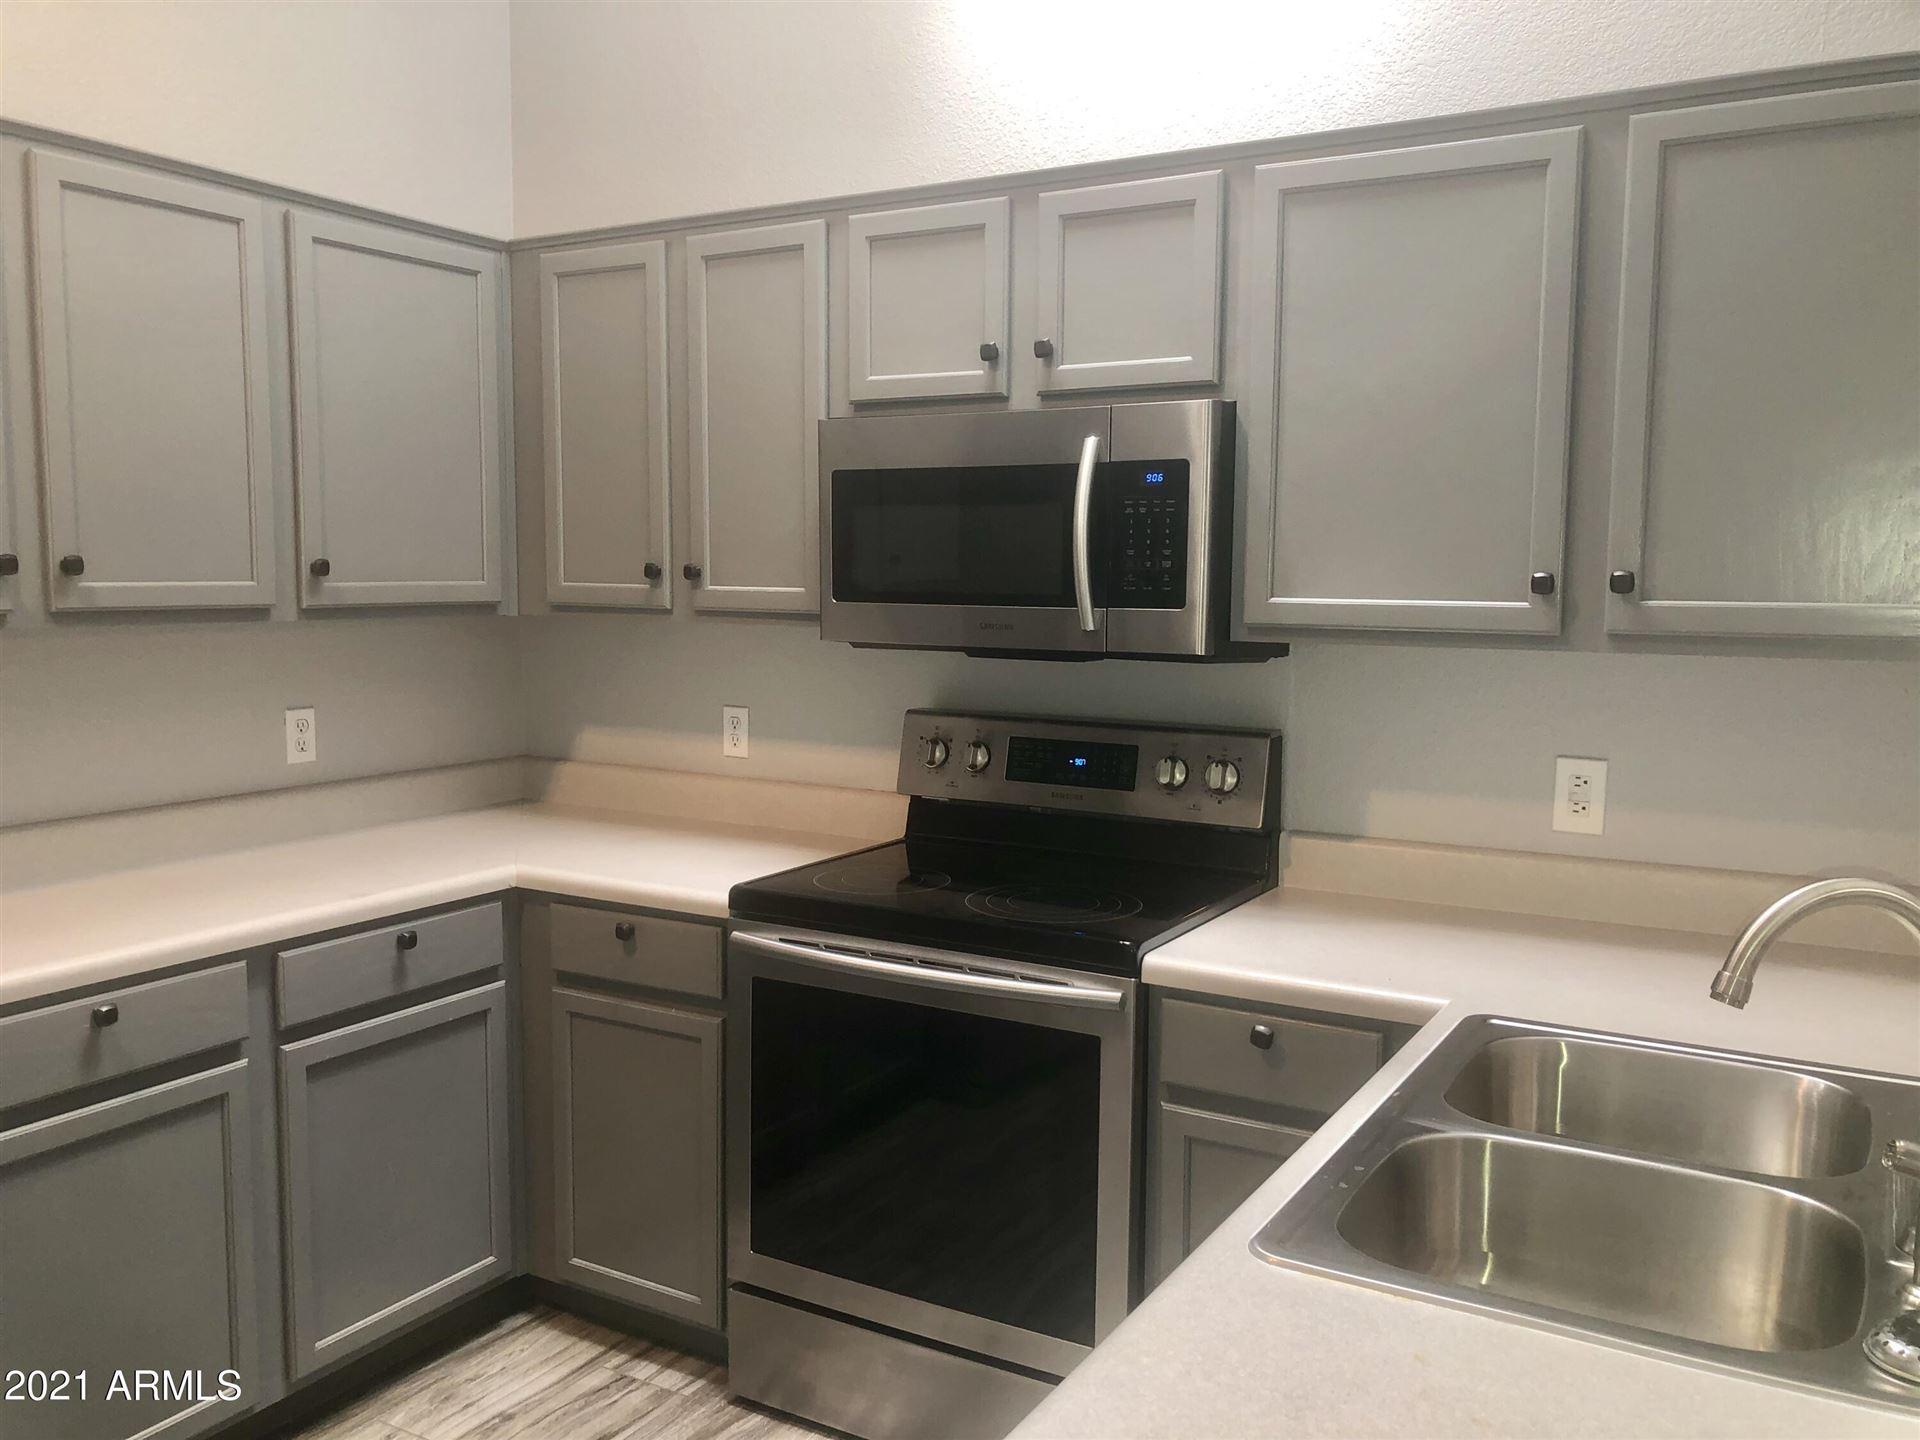 Photo of 64 N 63RD Street #4, Mesa, AZ 85205 (MLS # 6200725)